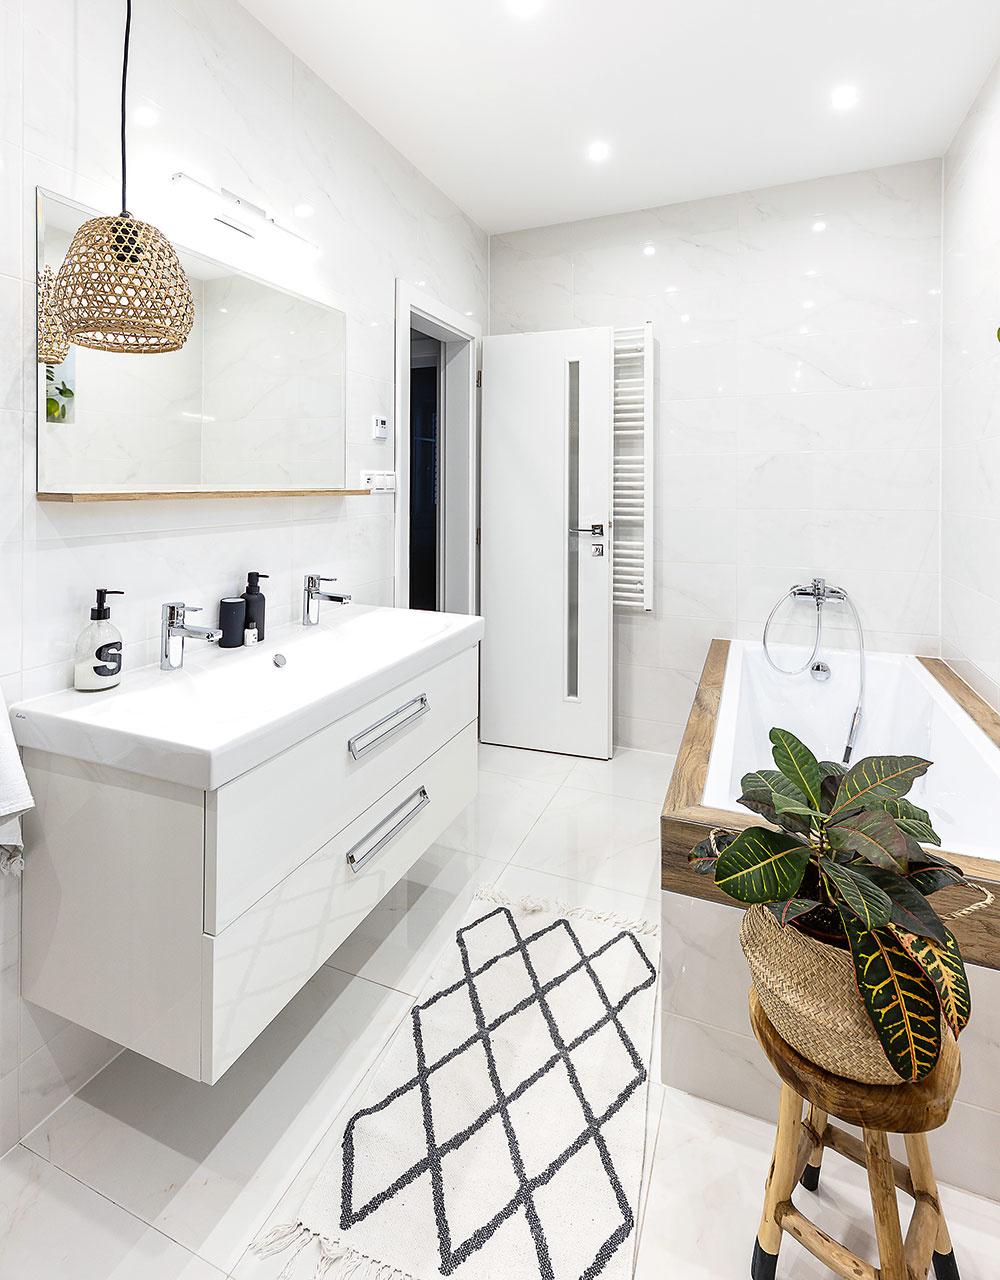 kúpeľňa s vaňou a velkým umývadlom